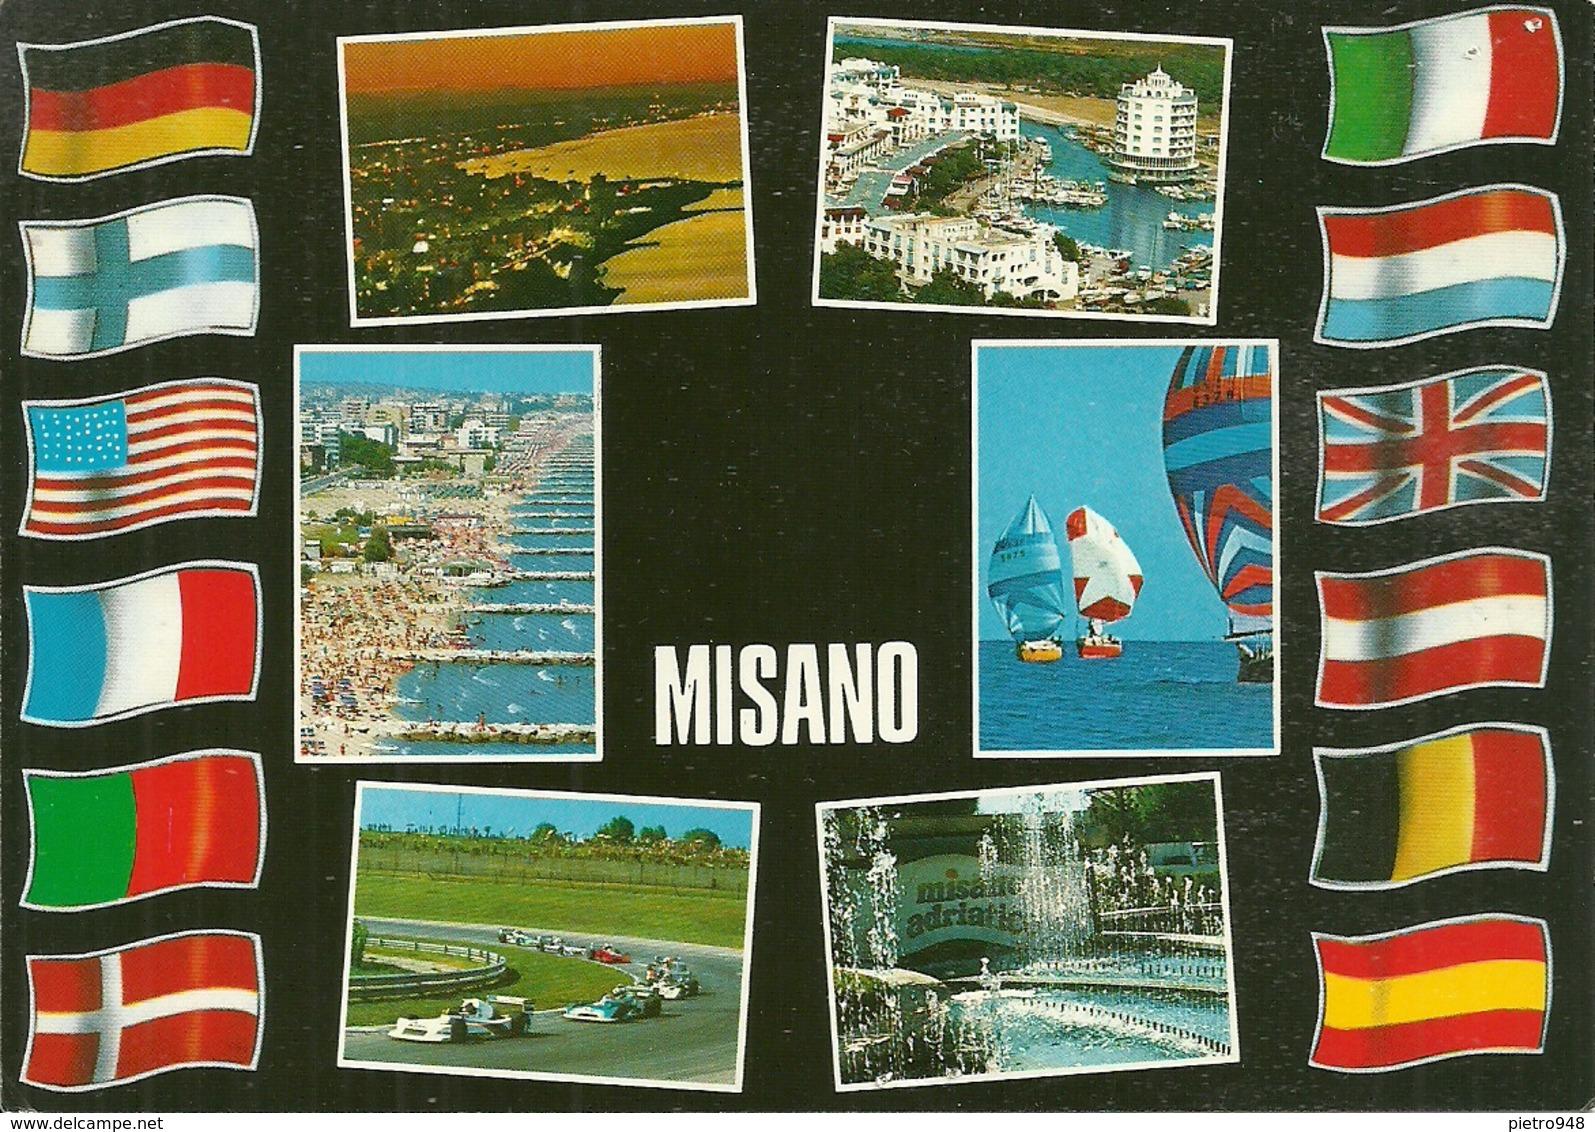 Misano Adriatico (Rimini) Vedute E Scorci Panoramici - Rimini